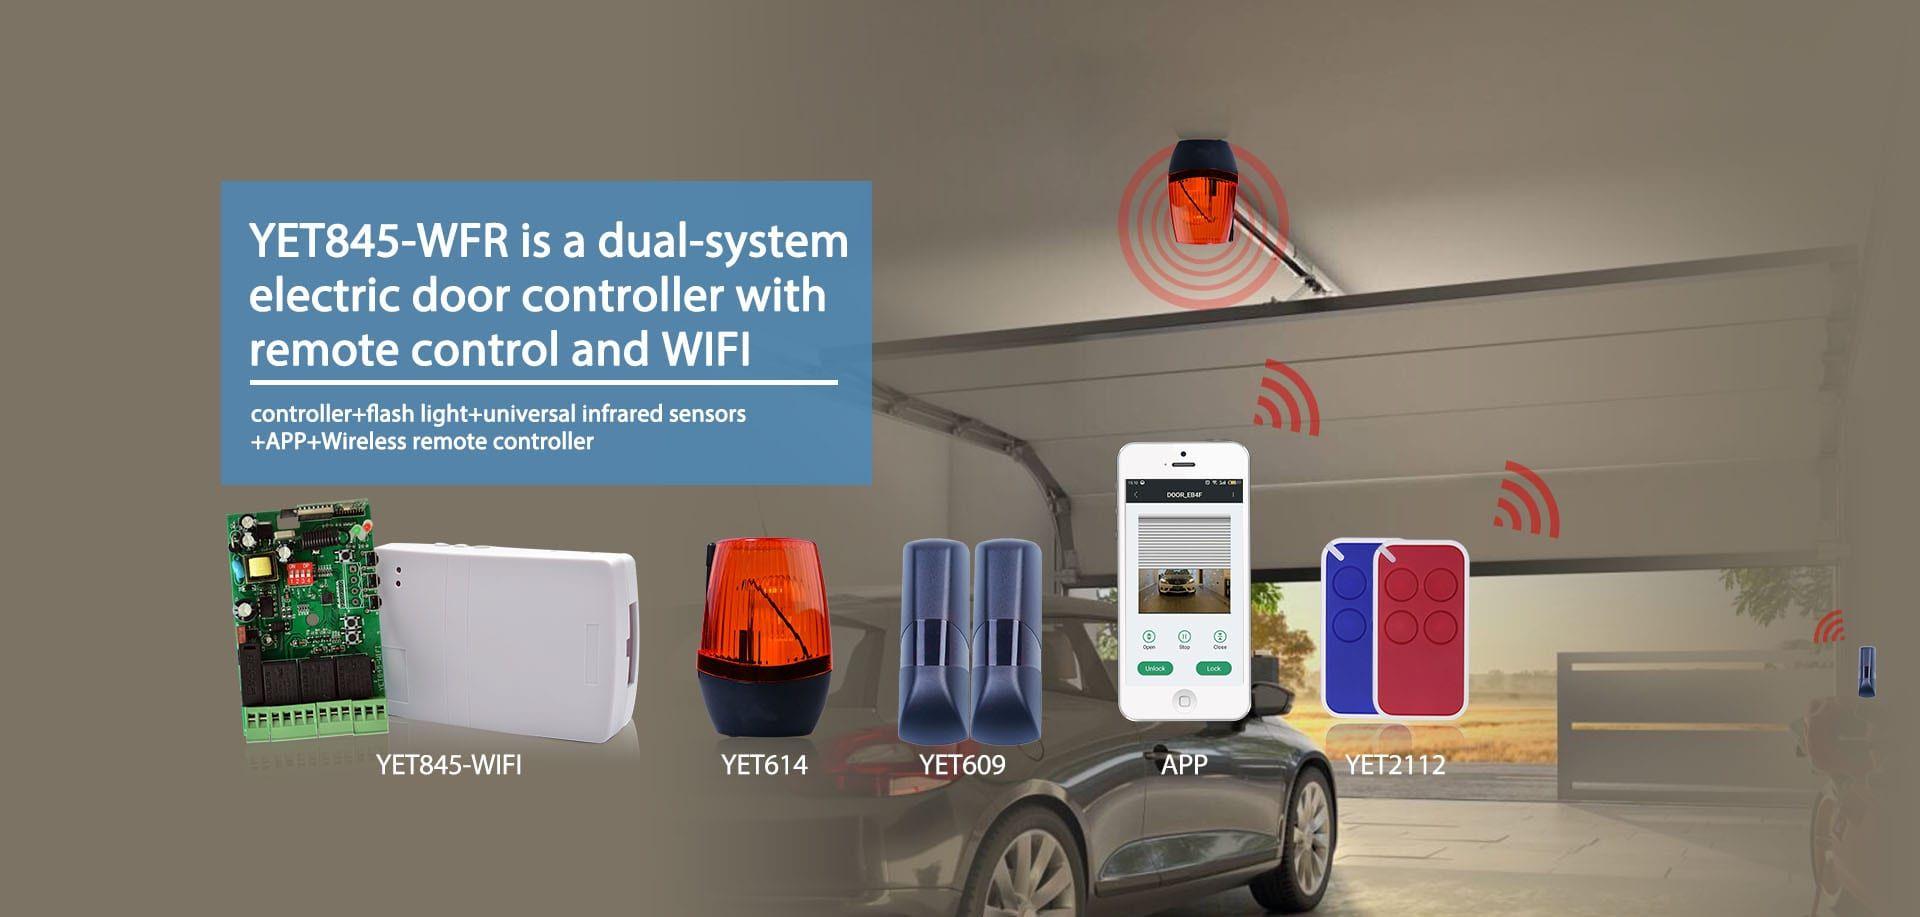 Garage Door Control System Smart Home Alarm System Remote Control Wifi